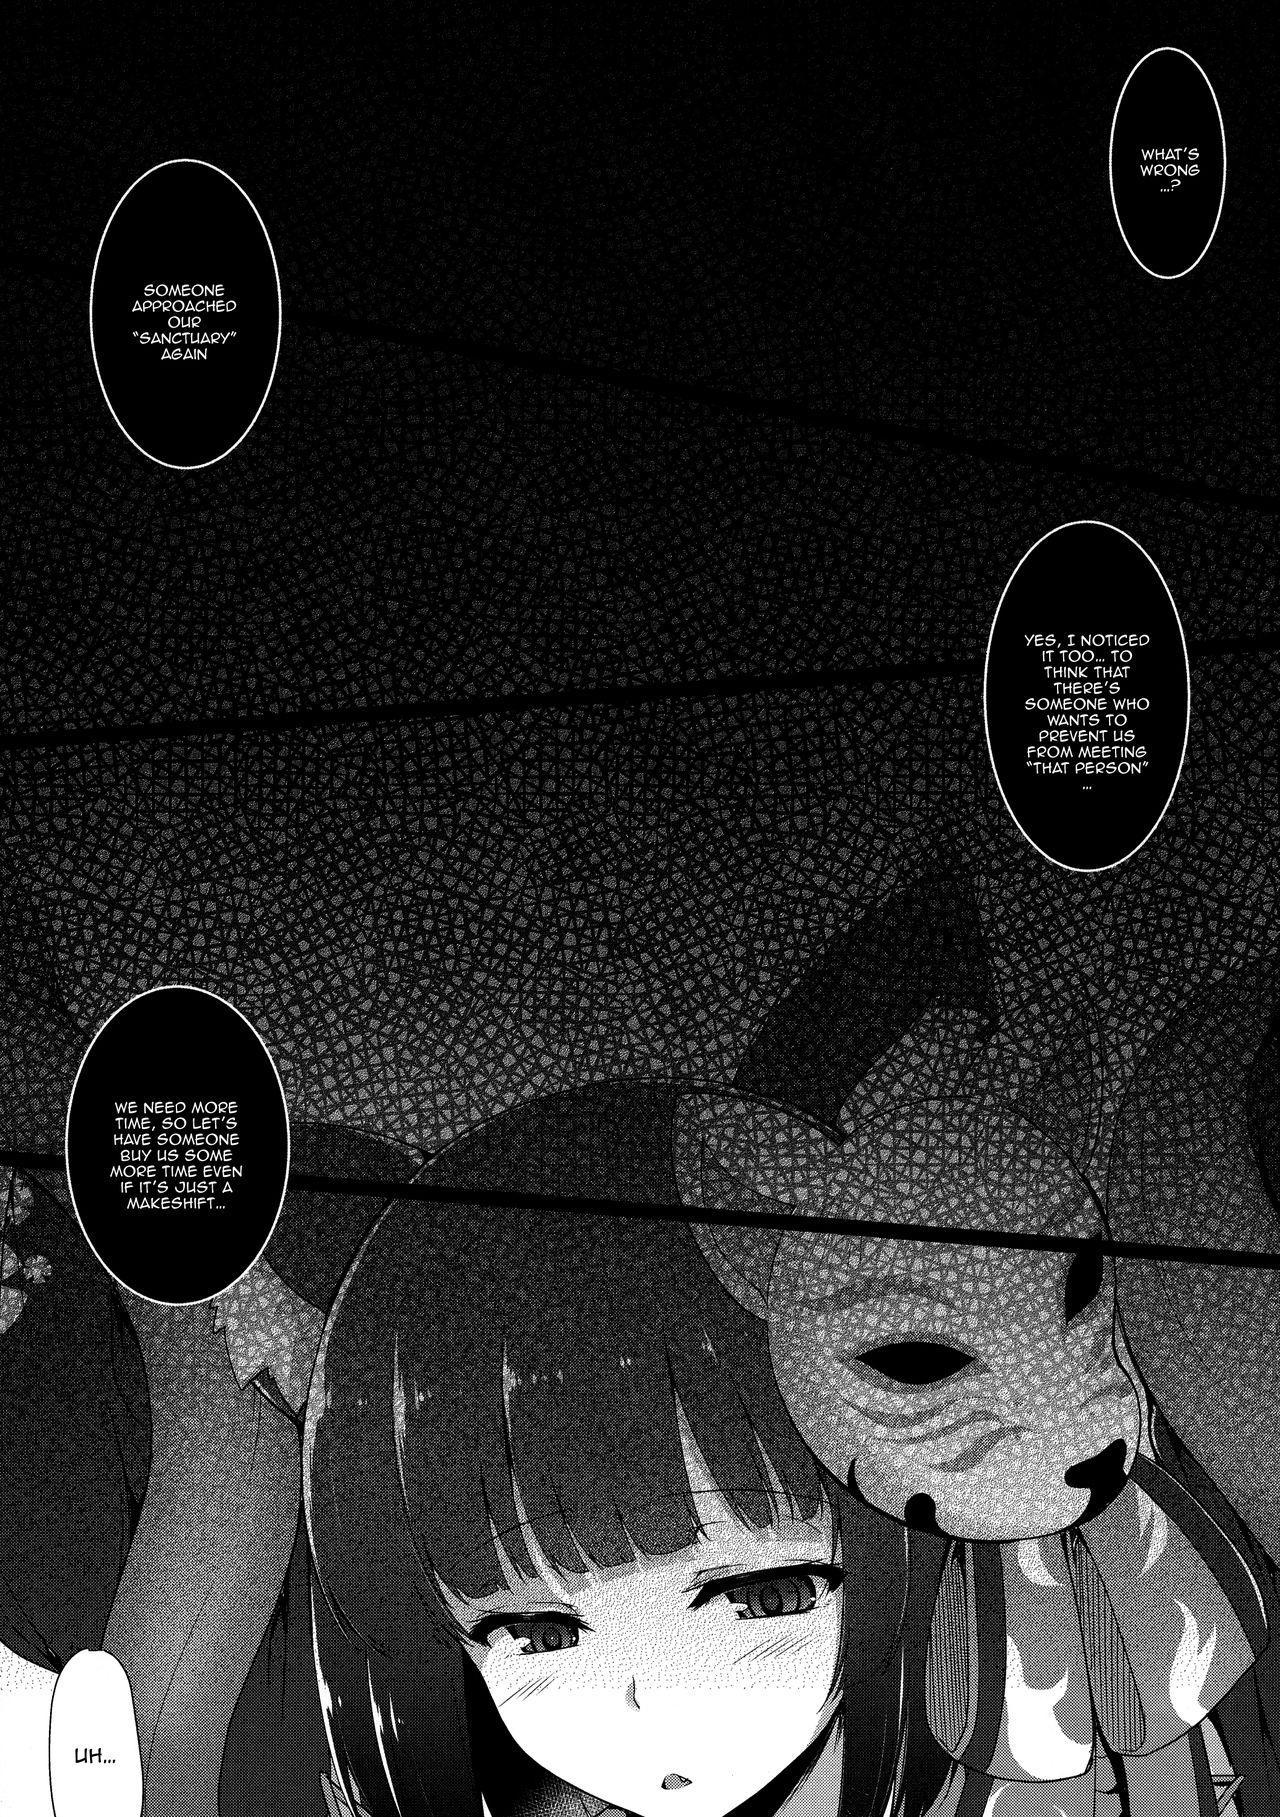 Kami-sama kara no Sazukemono   Something Granted From God 1